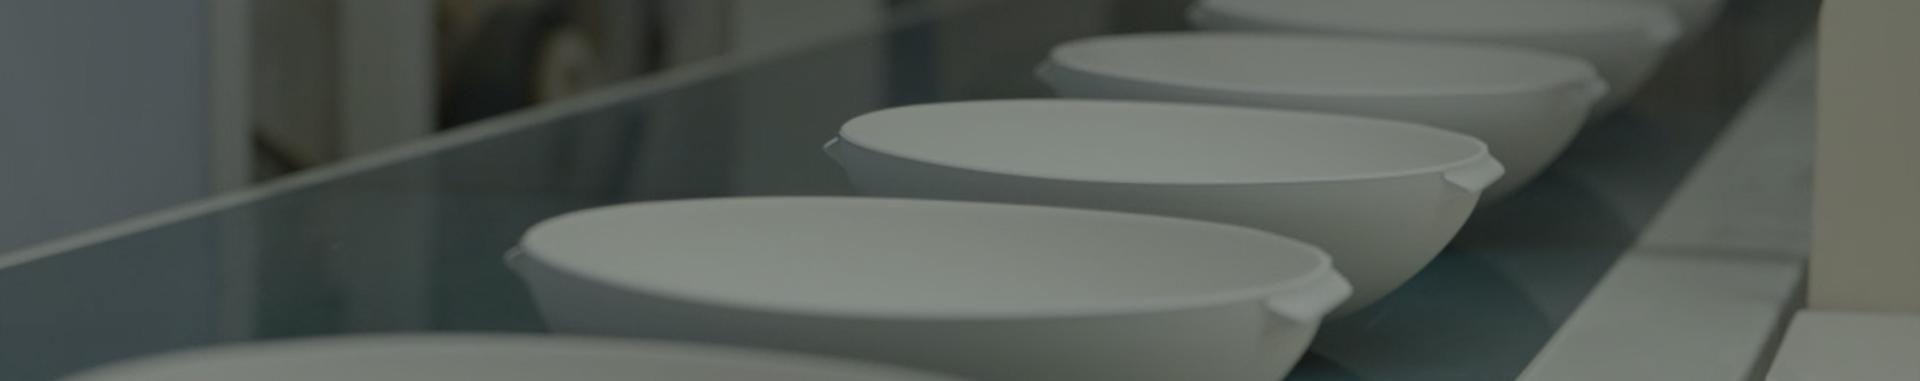 cerinnov tableware